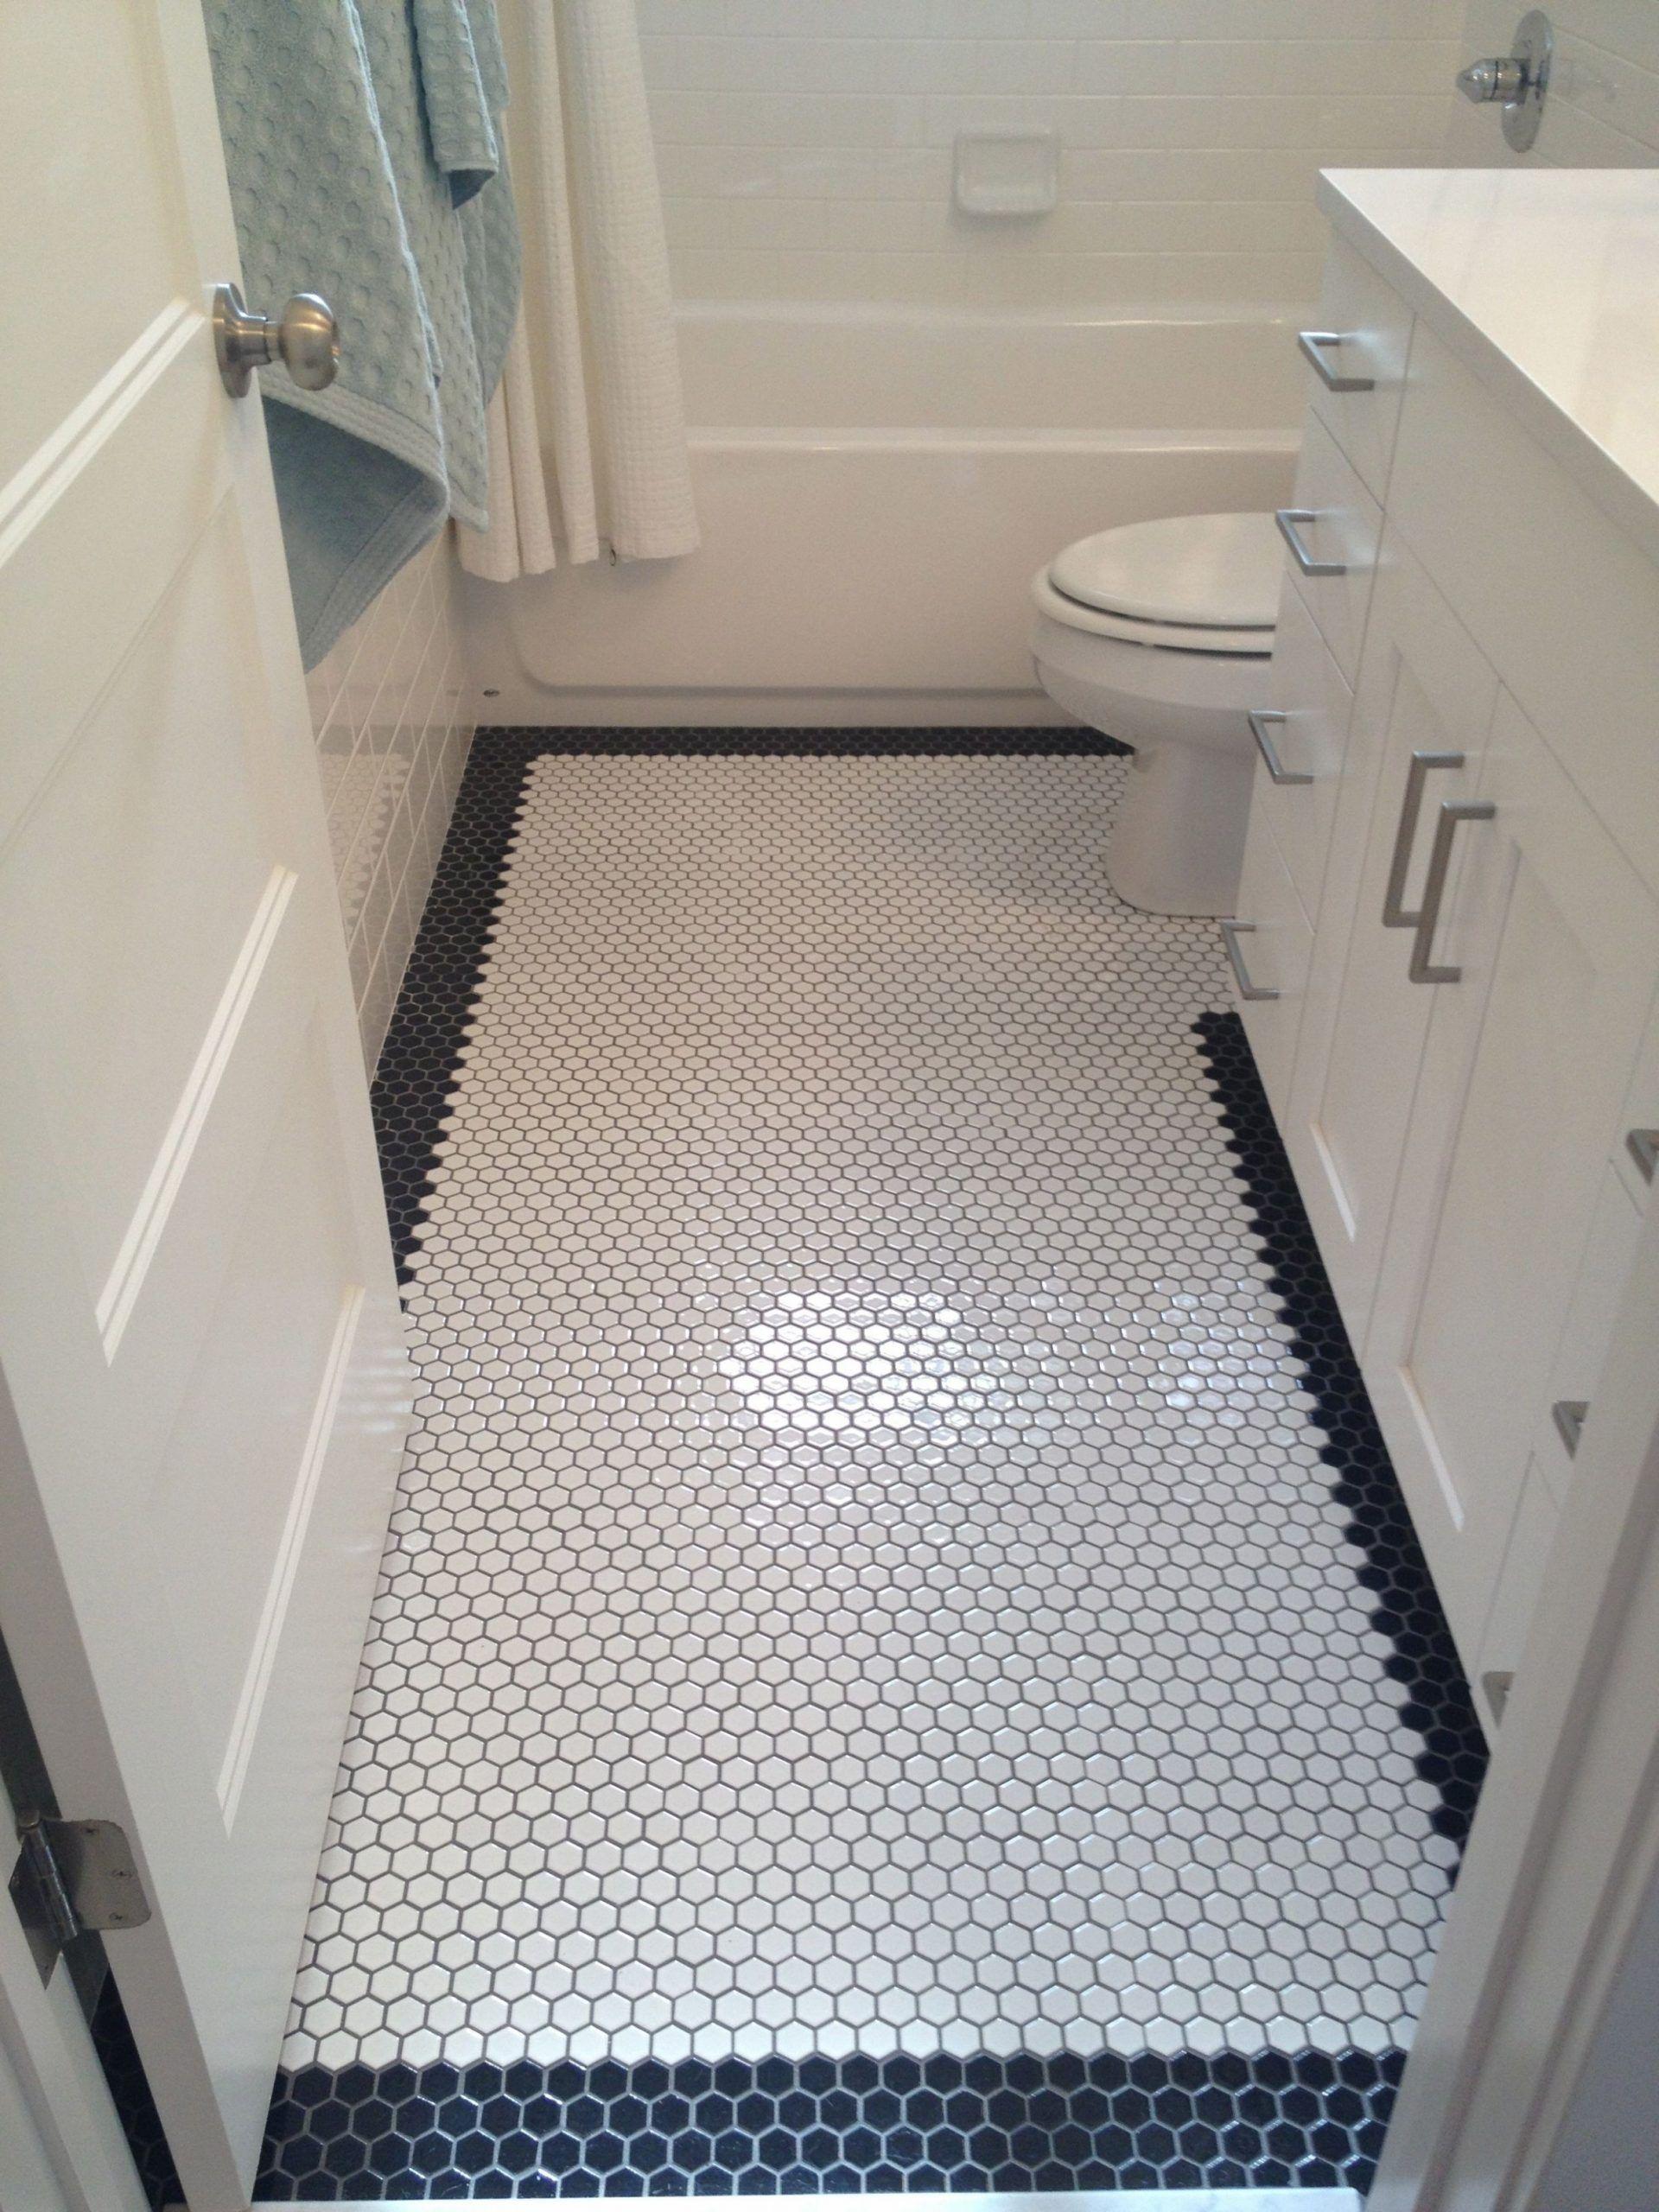 Bathroom Floor Tile Border Ideas In